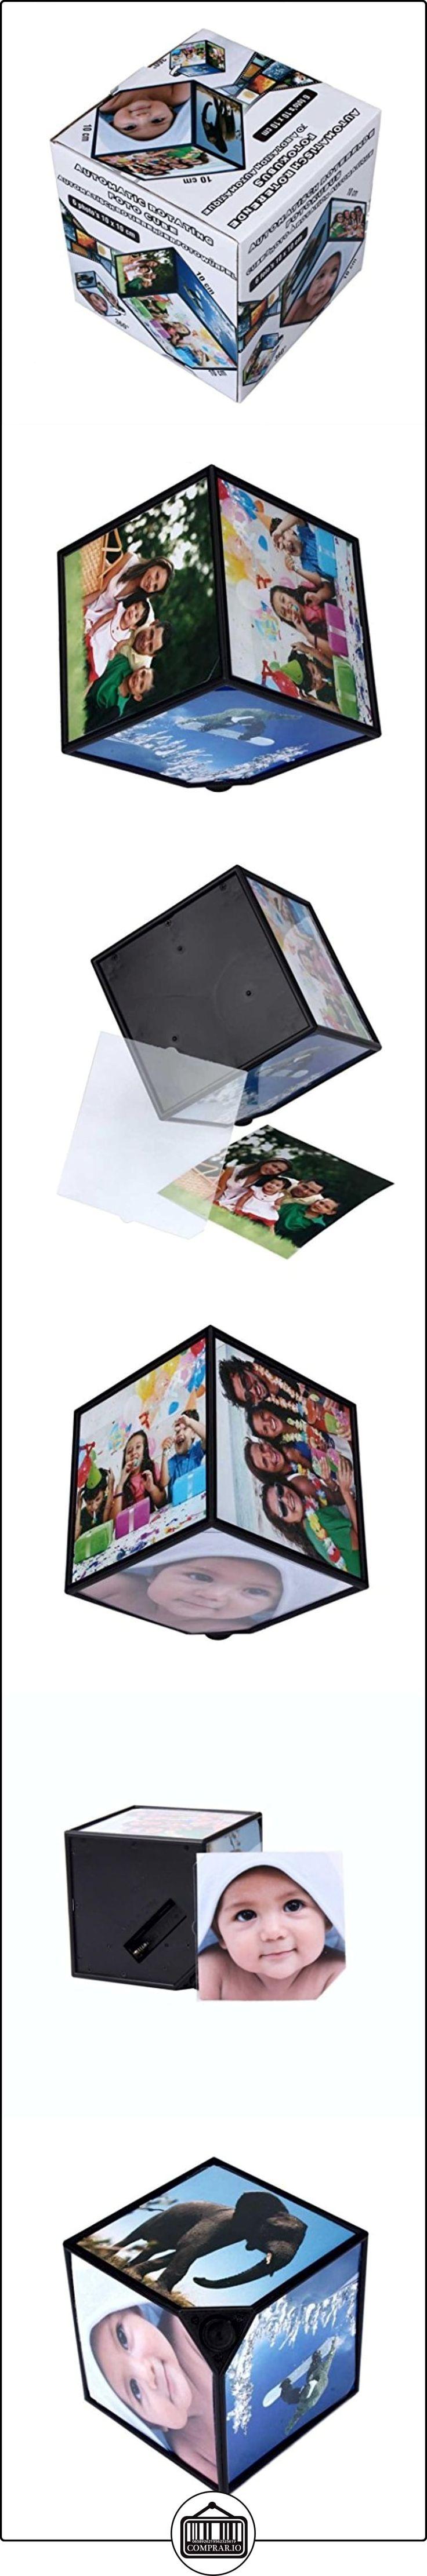 Kaiki rotación de frame,360 rerating revoling multi - Picture Photo Frames cubo negro decoracion de la casa familia  ✿ Regalos para recién nacidos - Bebes ✿ ▬► Ver oferta: http://comprar.io/goto/B01N3OWMWG